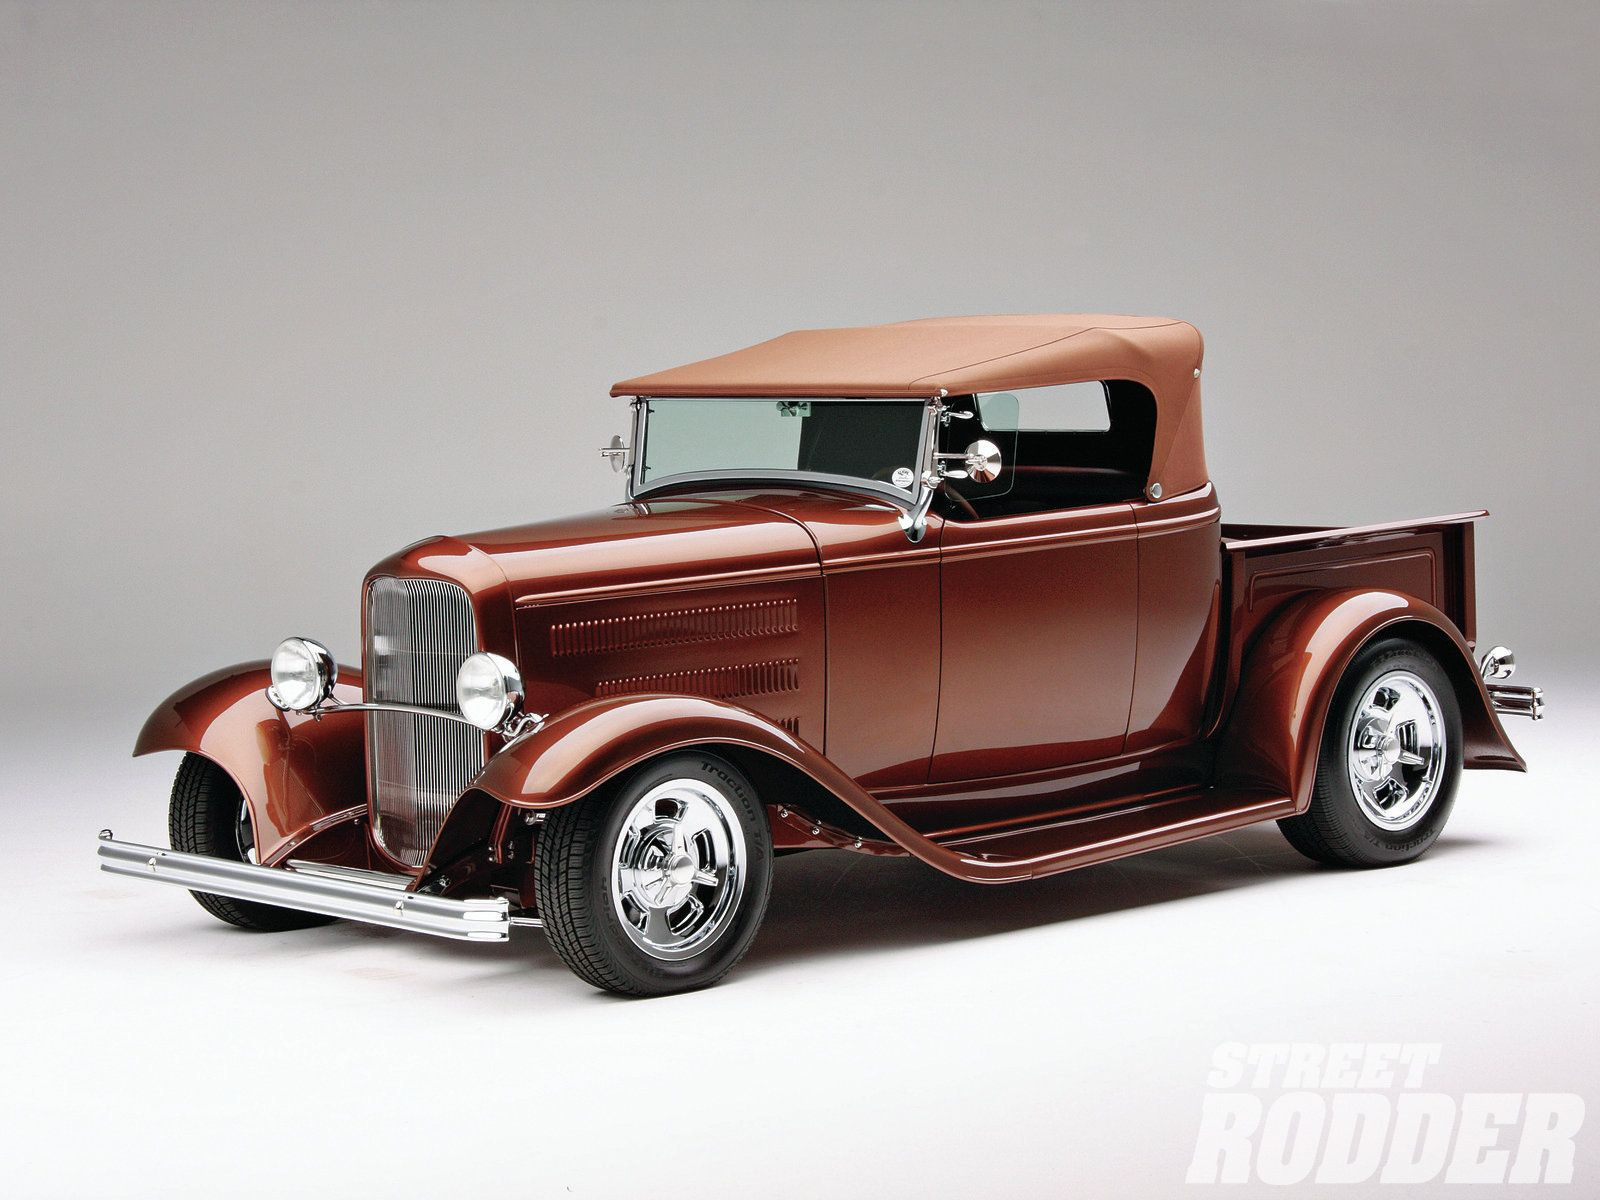 1934 Ford Roadster Pickup Trucks Maintenance/restoration of old ...